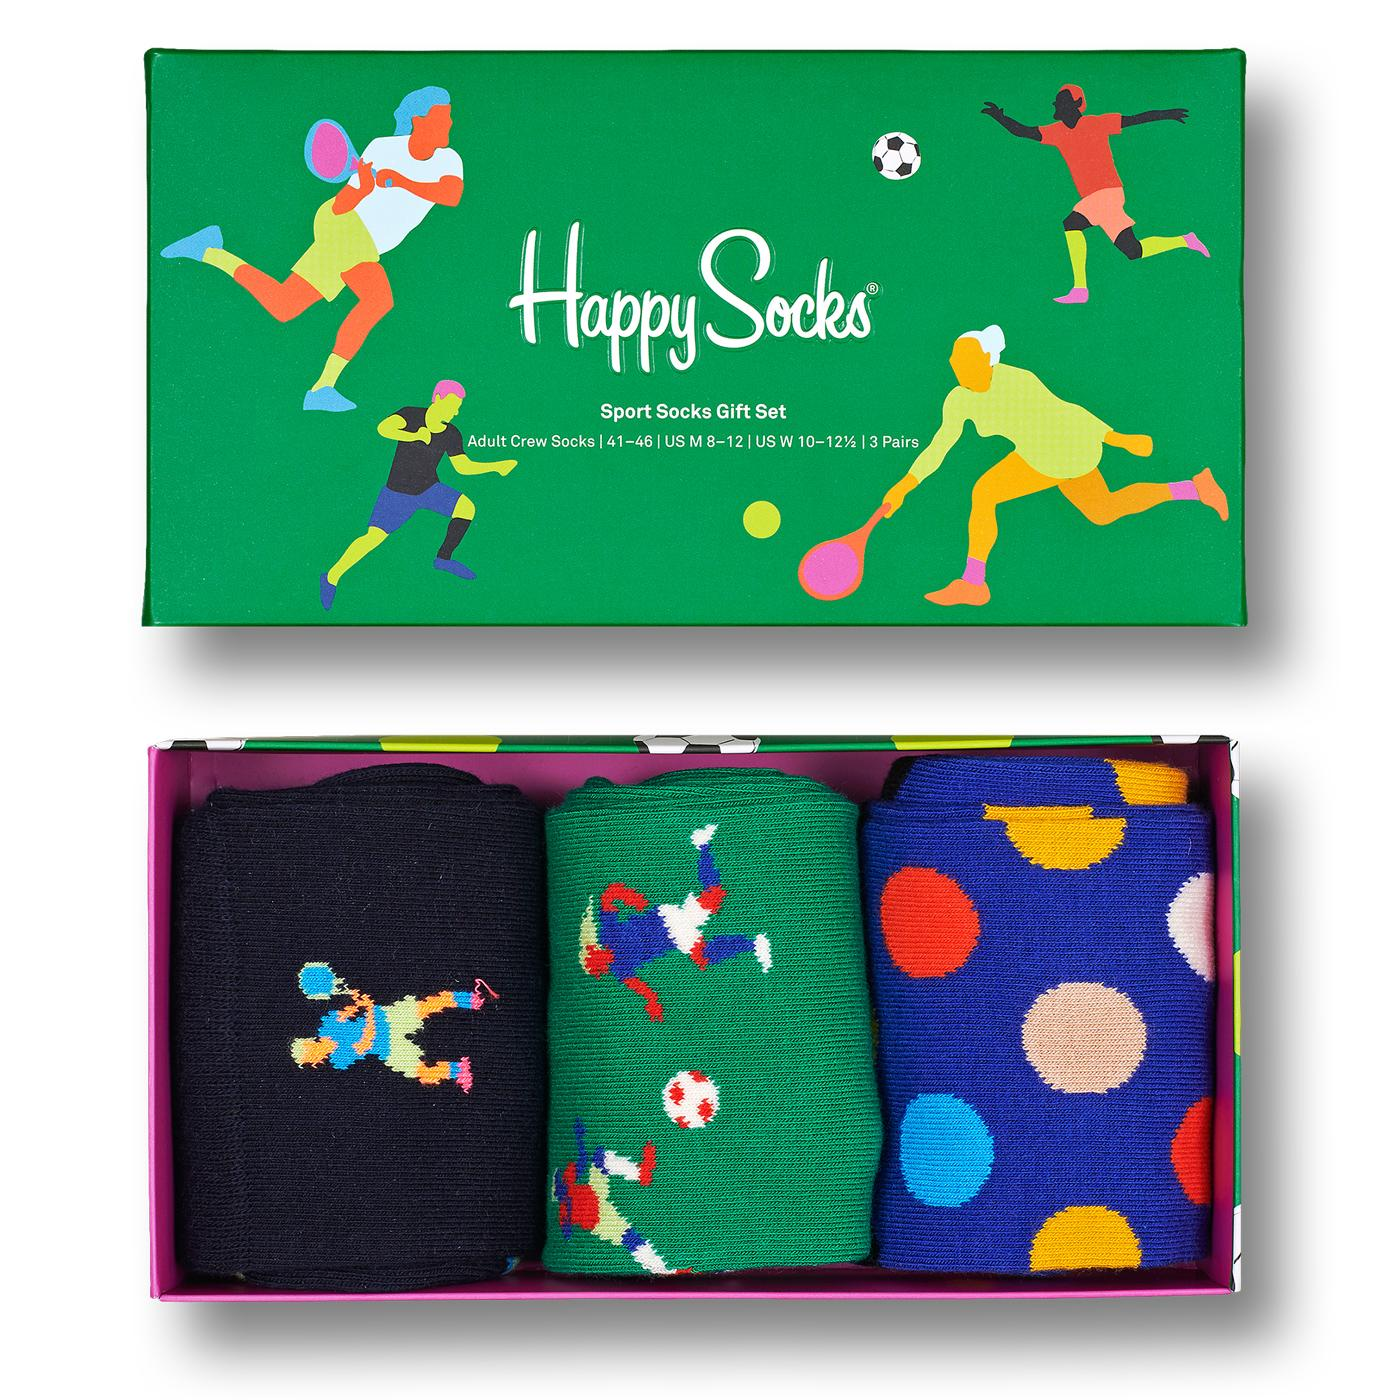 + HAPPY SOCKS 3 Pack Sports Socks Gift Set